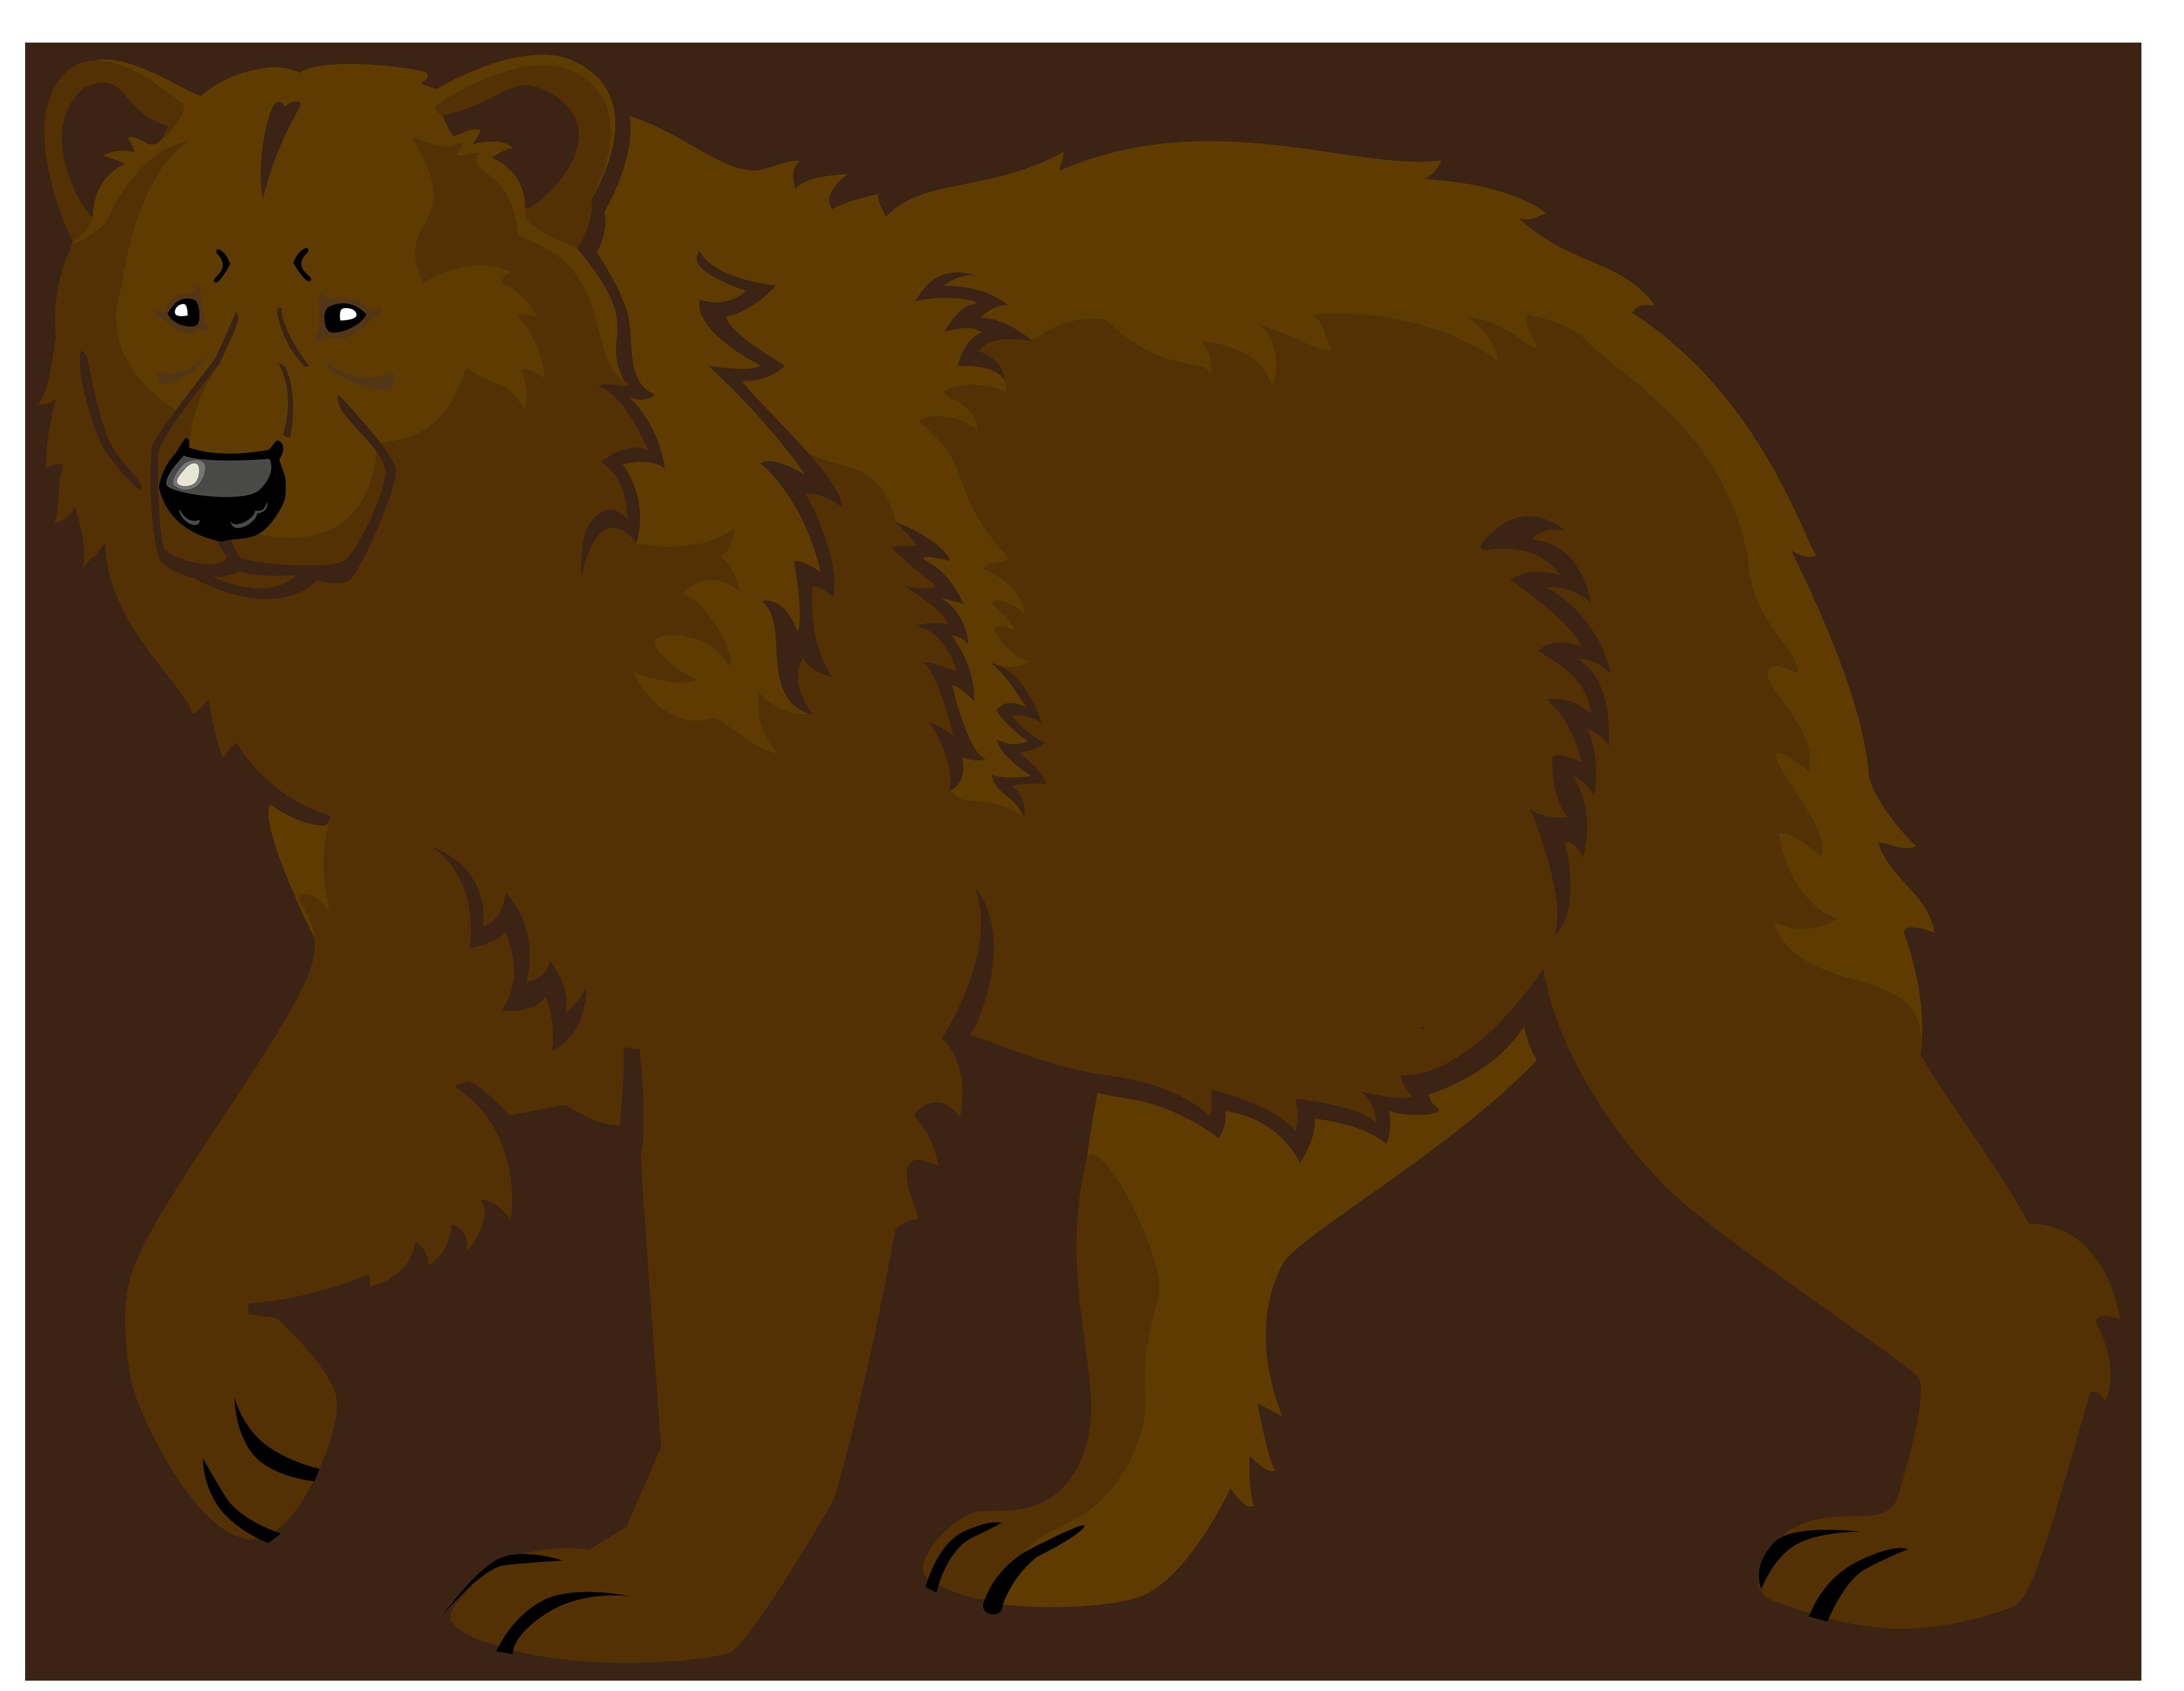 3 brown bears clipart clip library Brown bear Polar bear American black bear Giant panda - bear png ... clip library